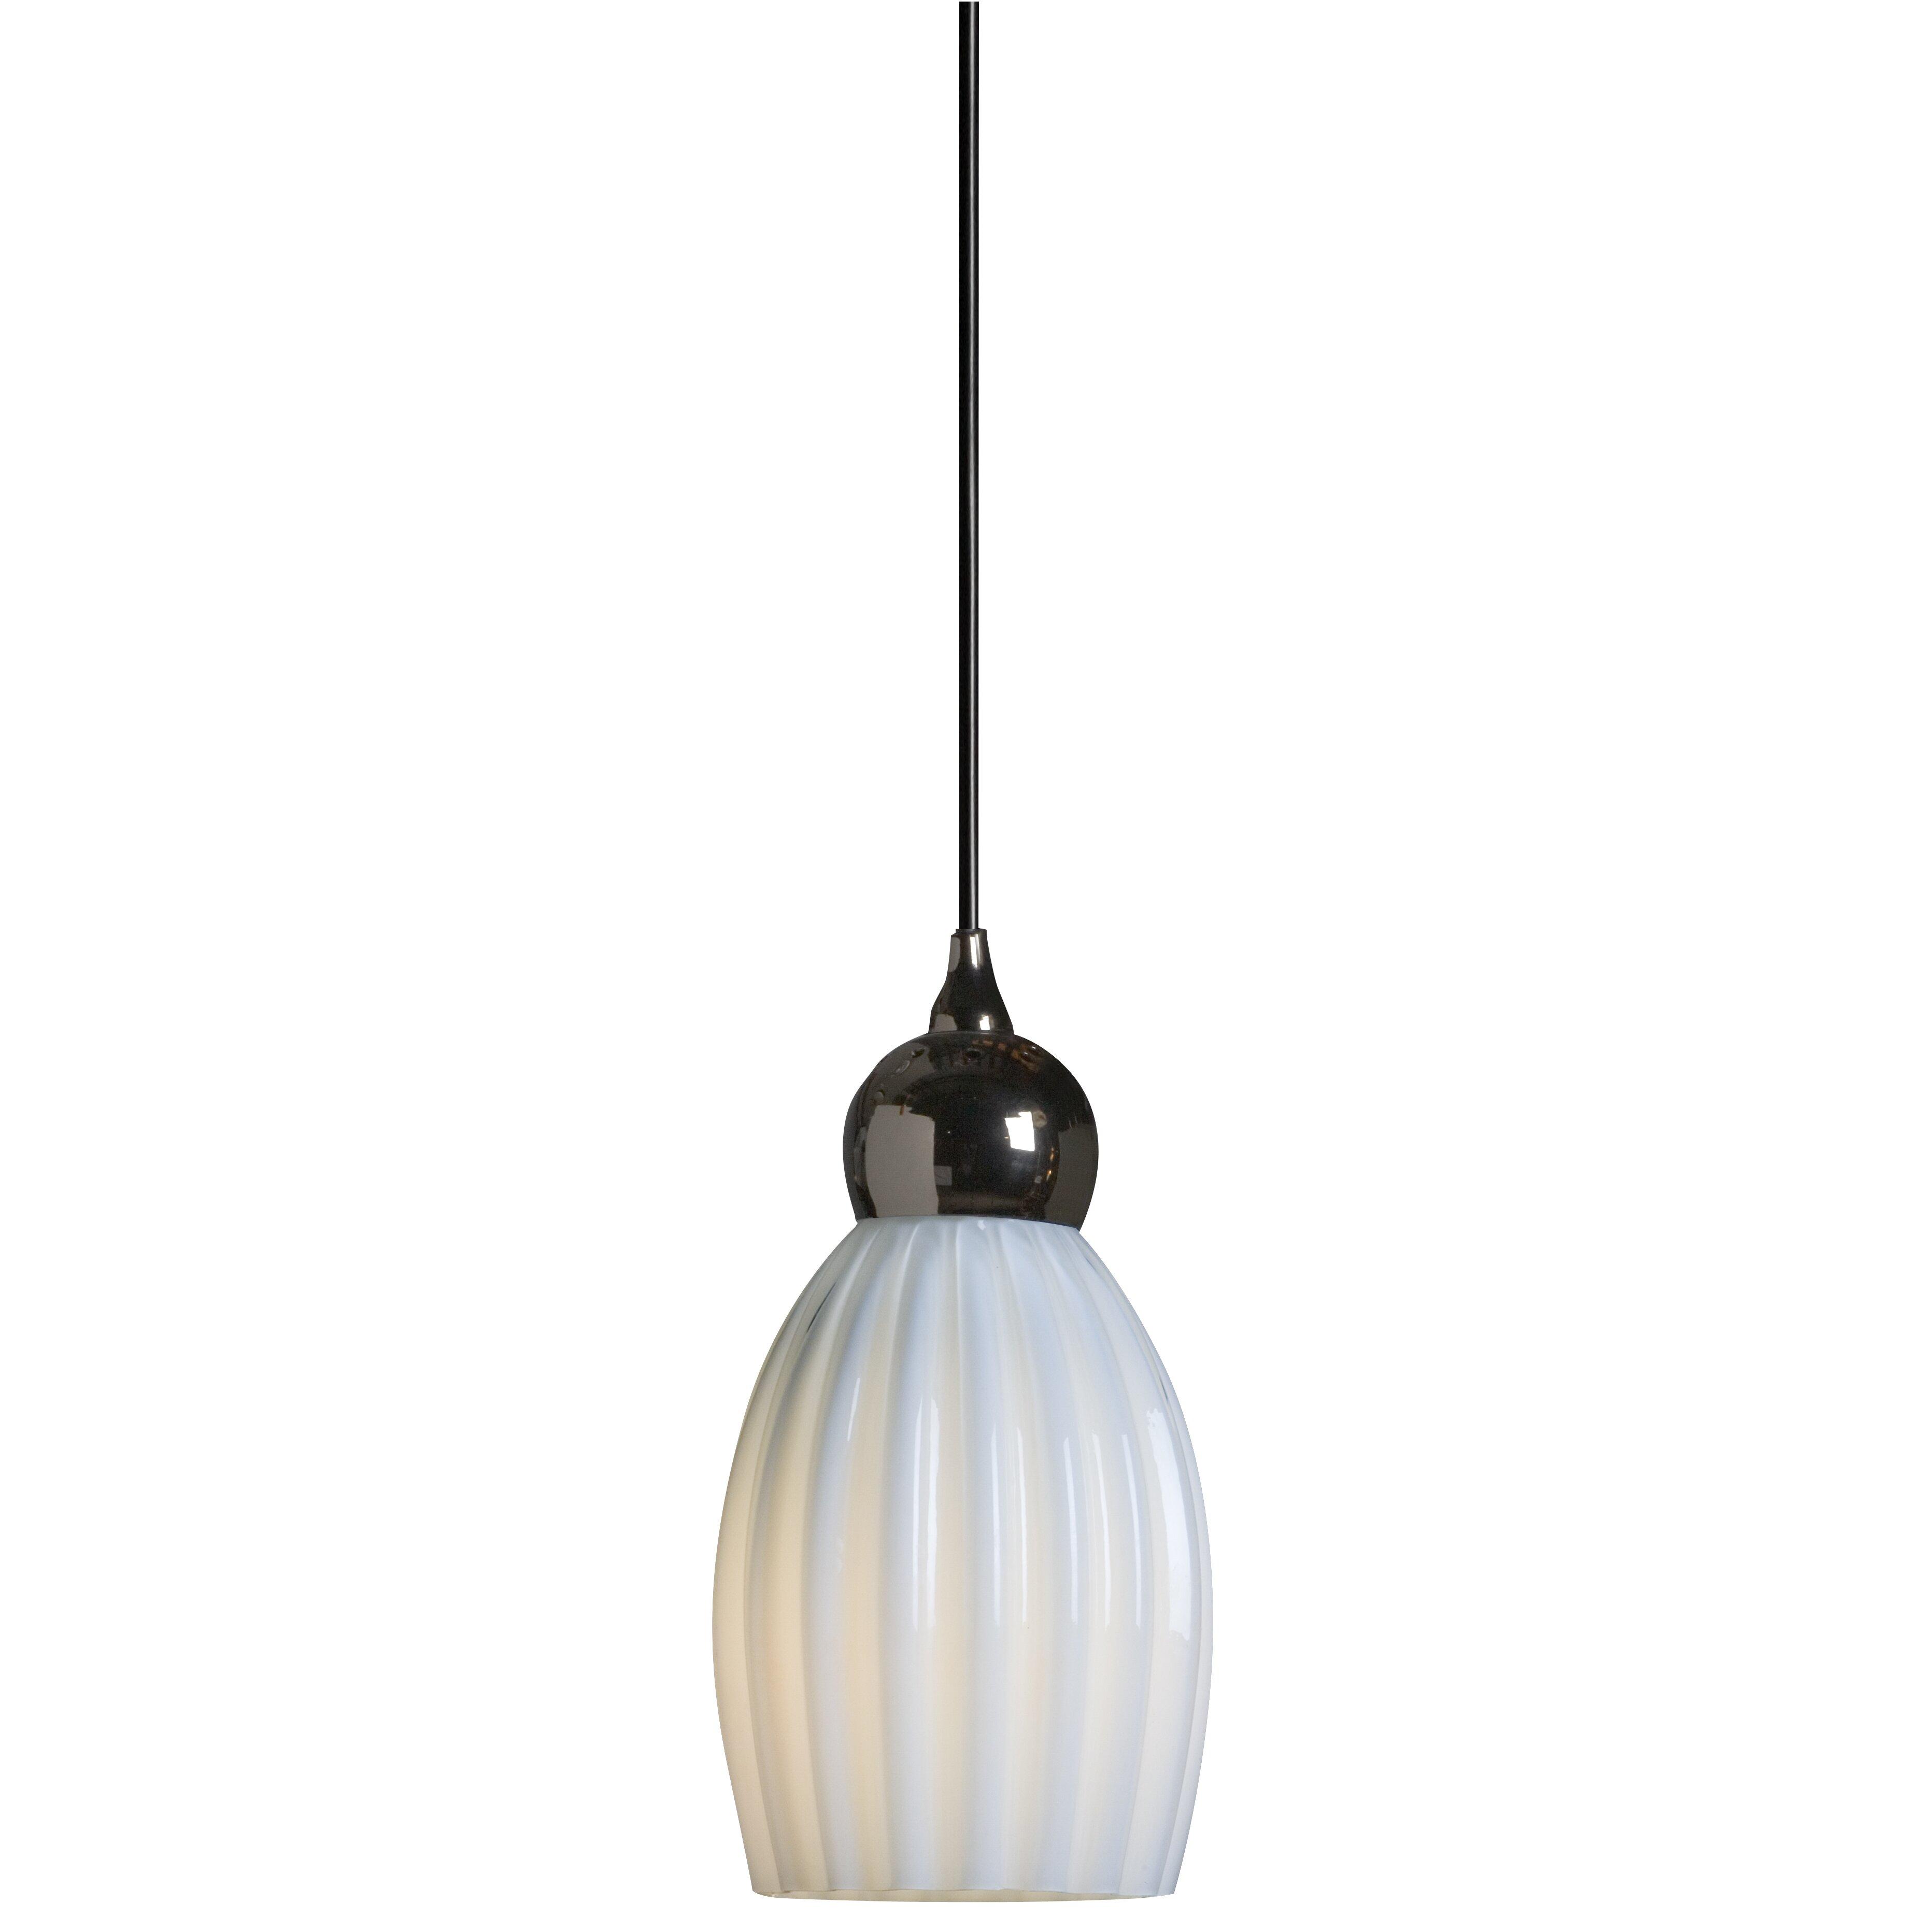 Radionic Hi Tech Vietra 1 Light Mini Pendant Reviews Wayfair Lighting Fixtures Duralite